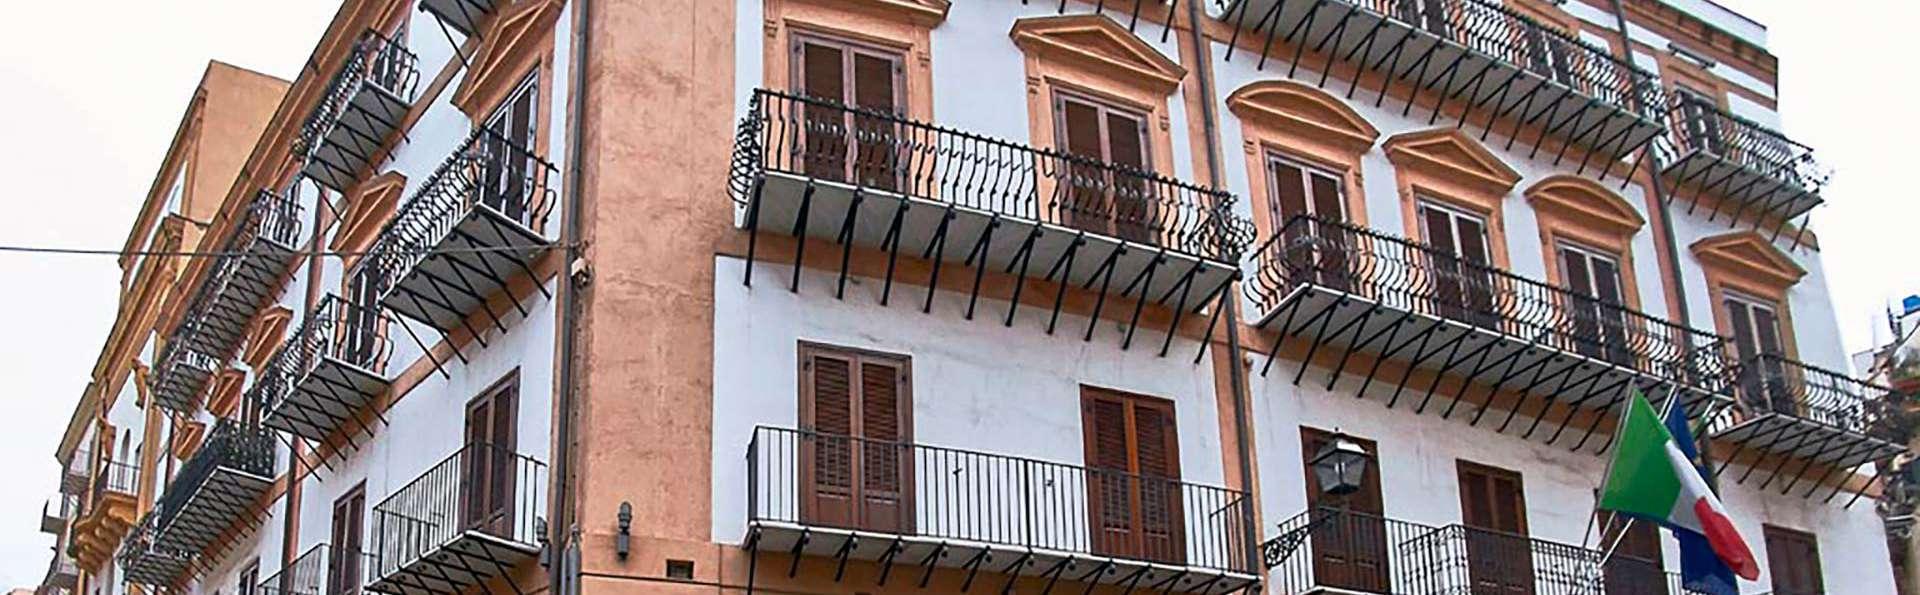 Hotel Palazzo Sitano - EDIT_FRONT_02.jpg